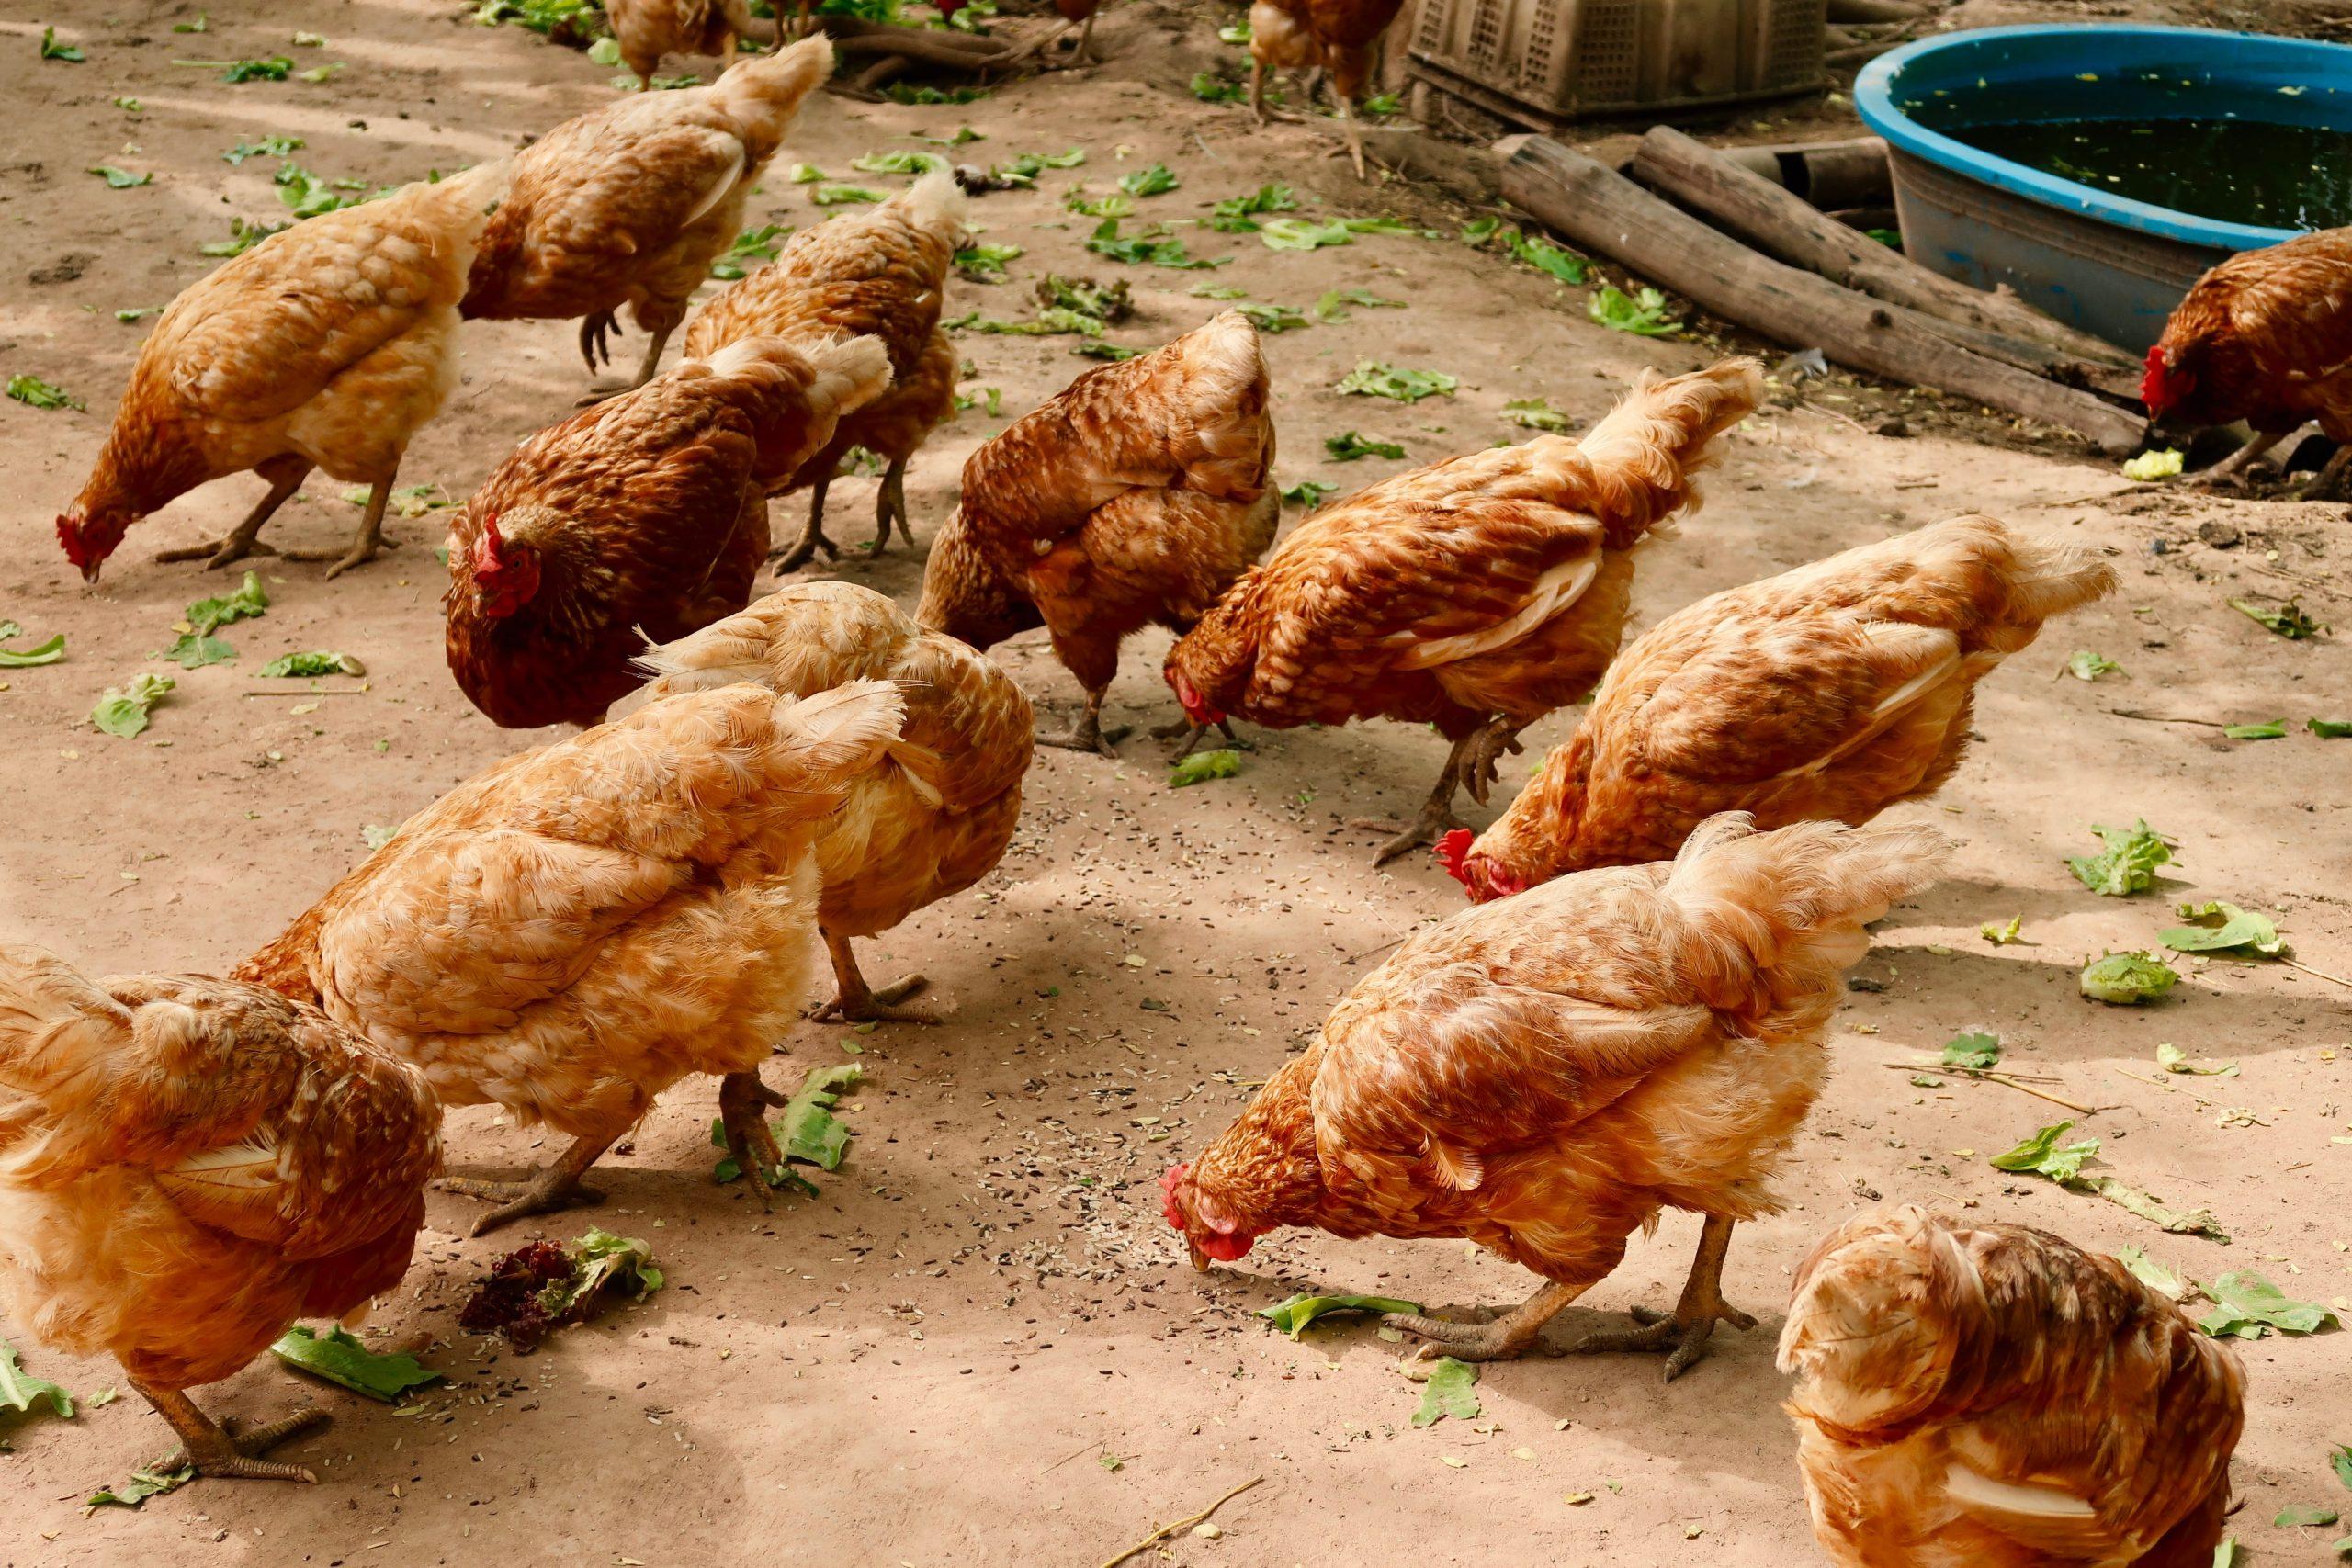 PTIČJA GRIPA PRED VRATIMA Sumnjivo gotovo šest tona mesa peradi